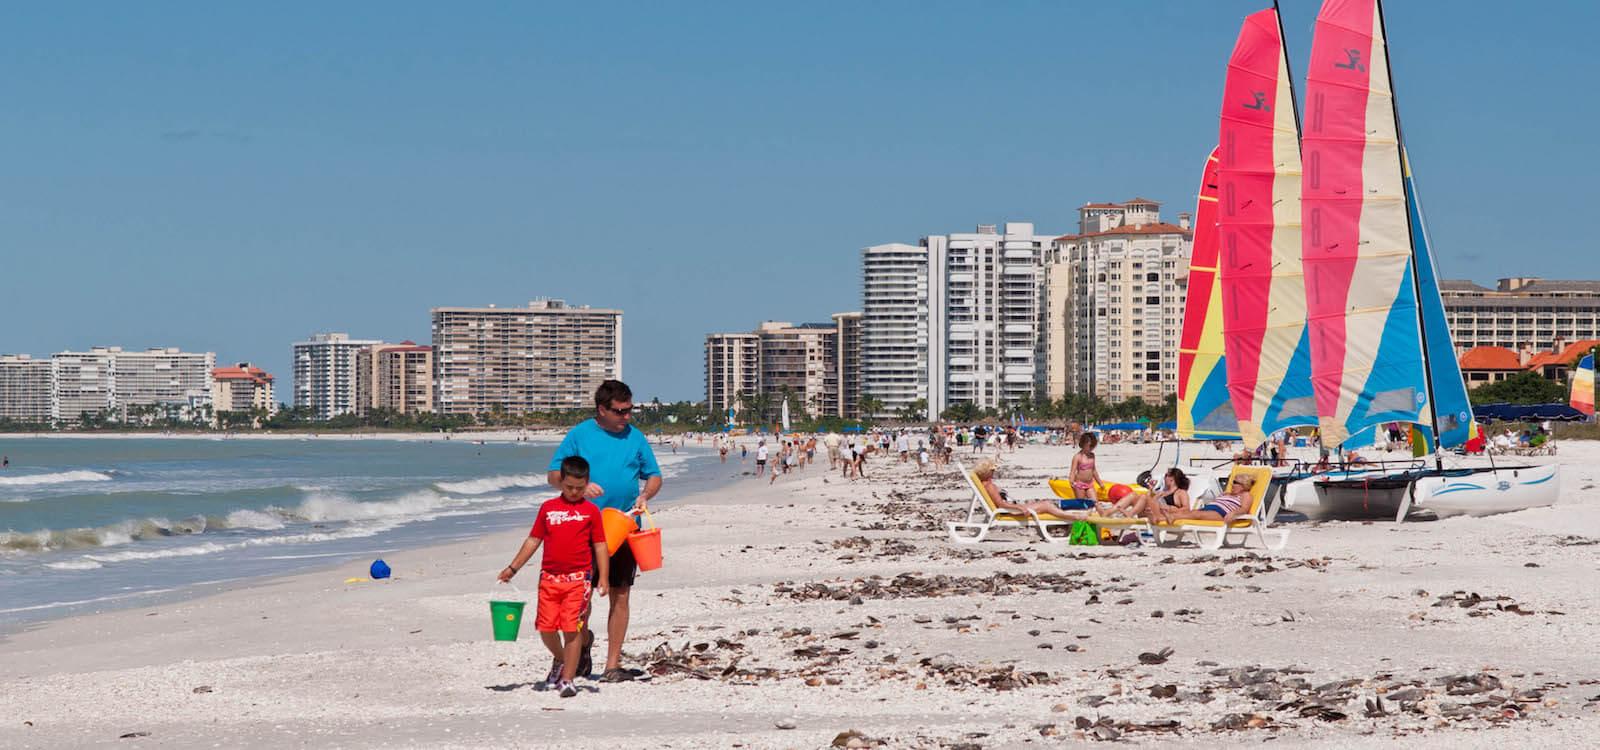 Gulf of Mexico at Marco Island, Florida, USA. Photo by Debi Pittman Wilkey